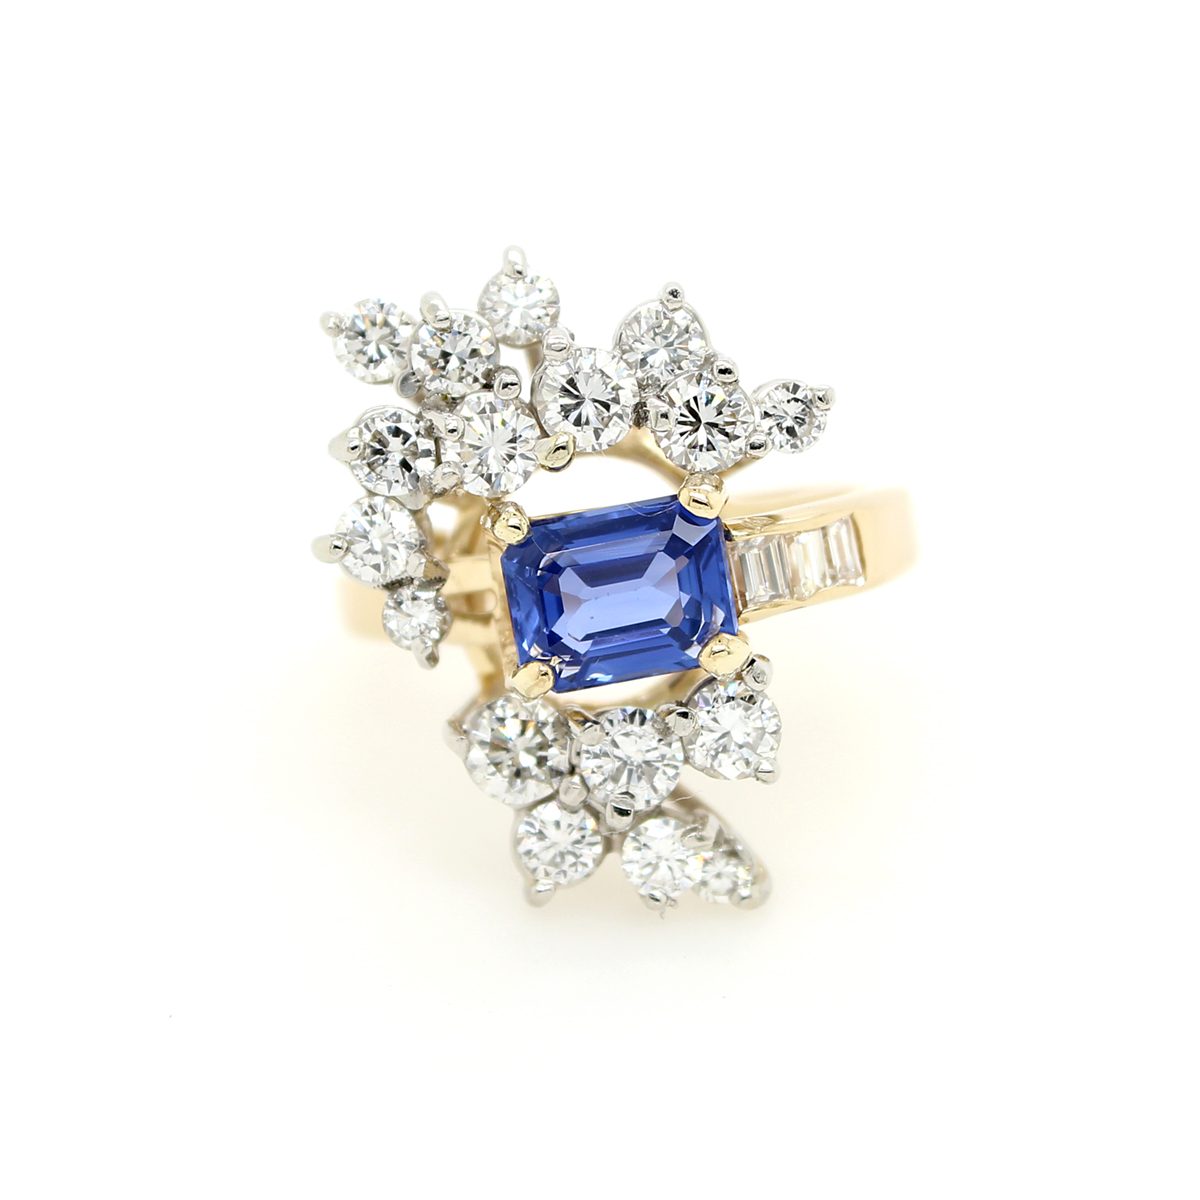 Vintage 18 Karat Yellow Gold Blue Sapphire and Diamond Cluster Ring